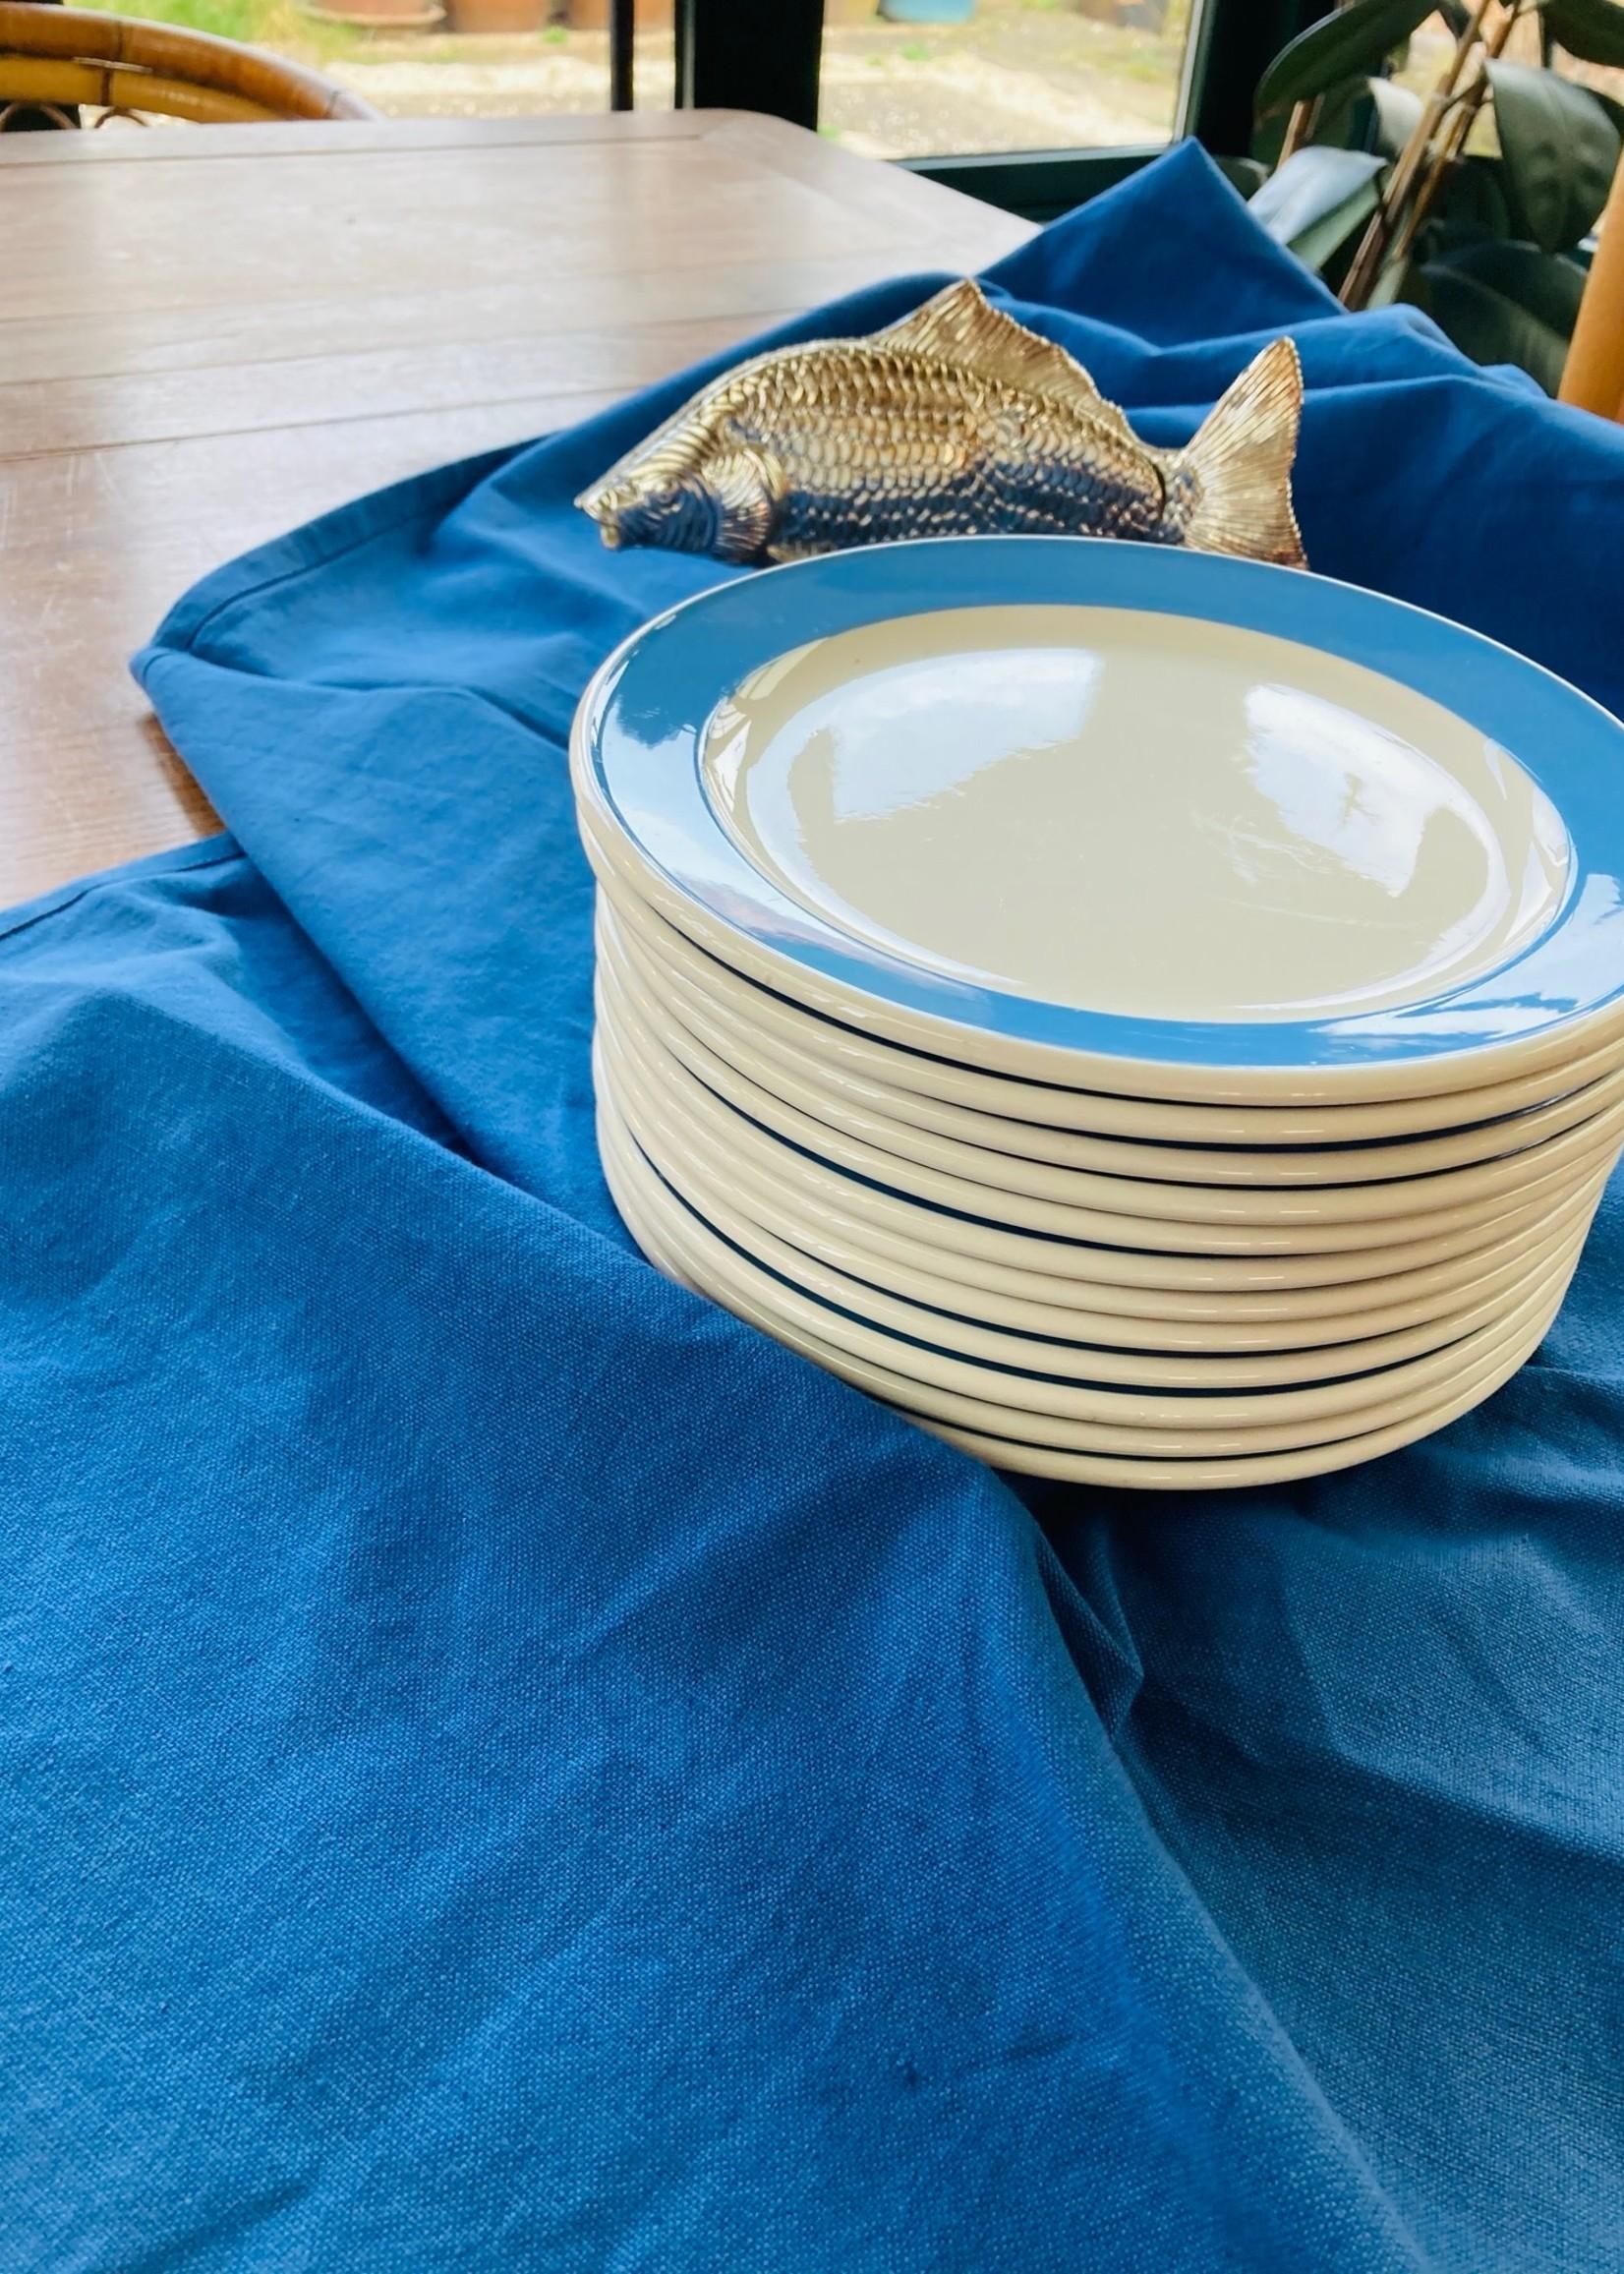 Dessert plate Blue Decor Orléans Villeroy & Boch France